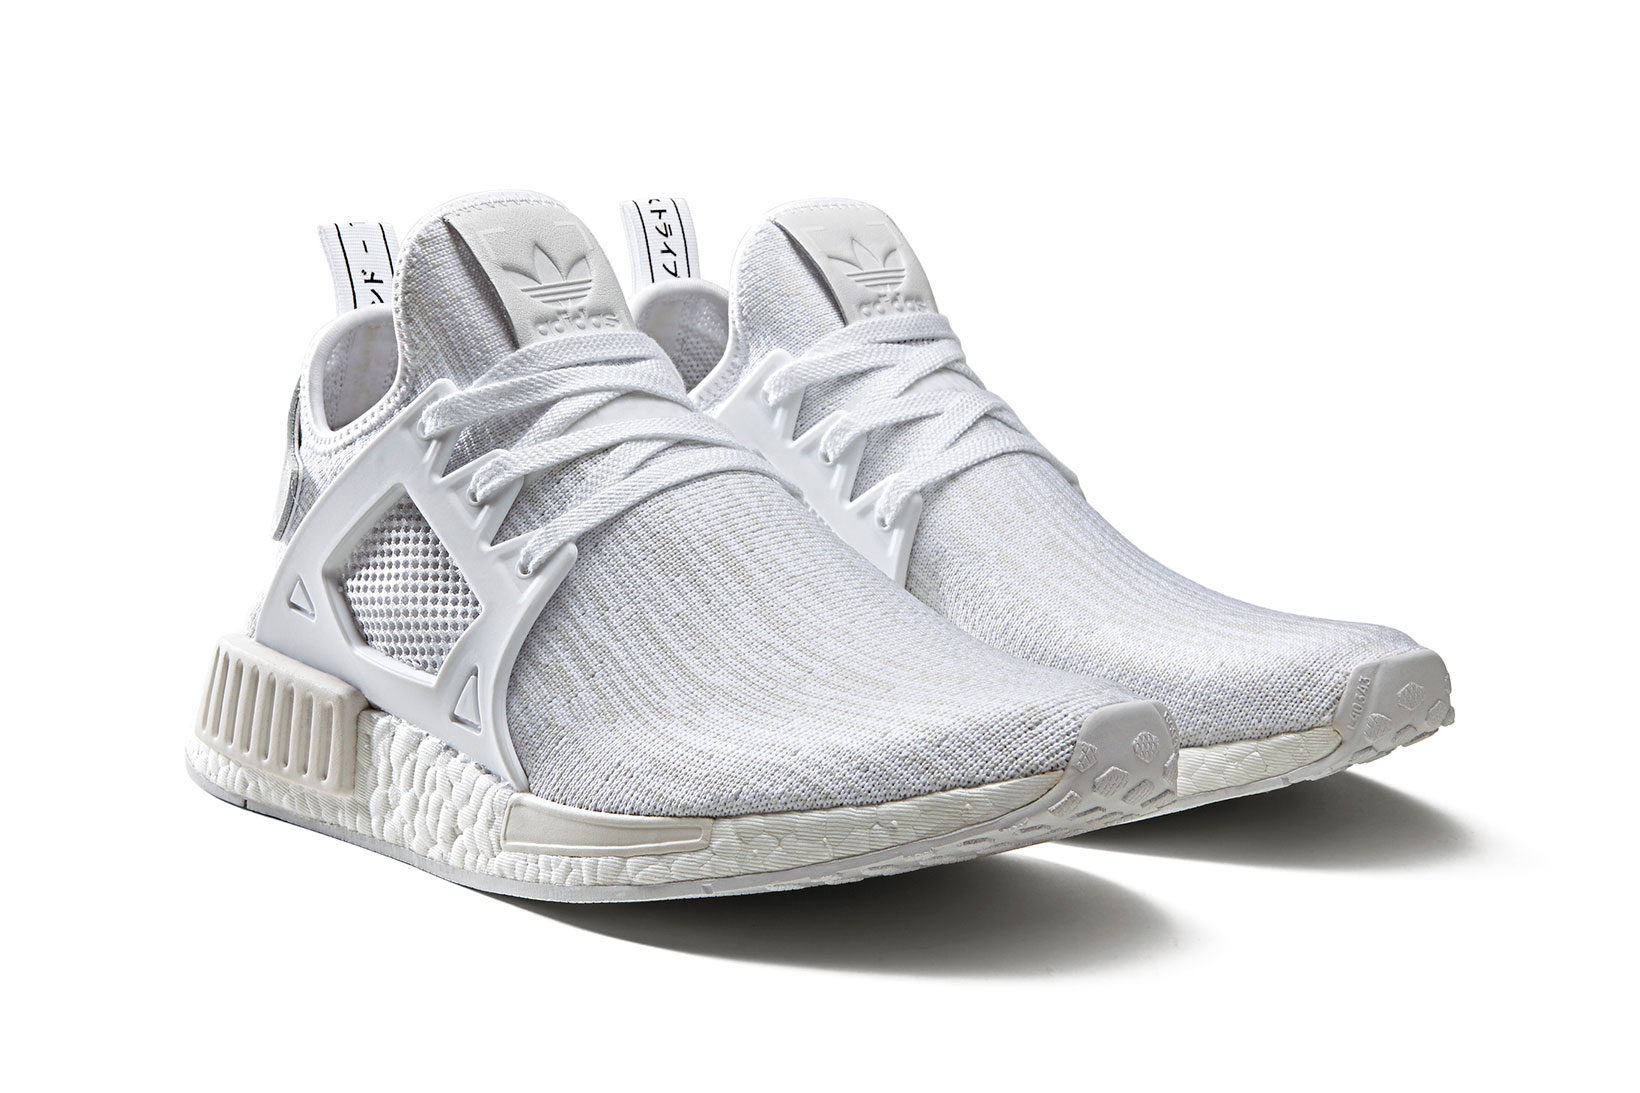 adidas originals nmd xr1 white sneaker hypebeast. Black Bedroom Furniture Sets. Home Design Ideas